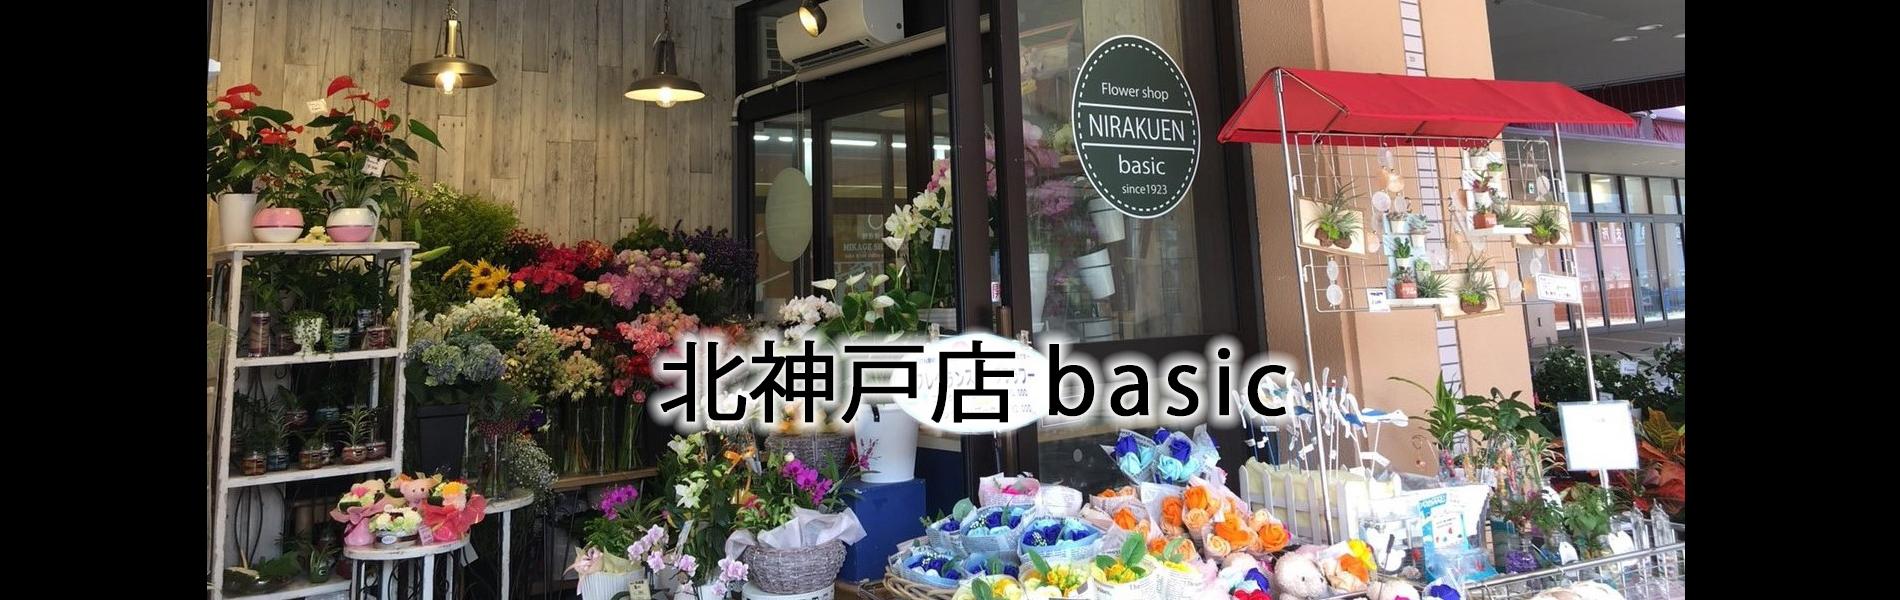 二楽園 北神戸basic